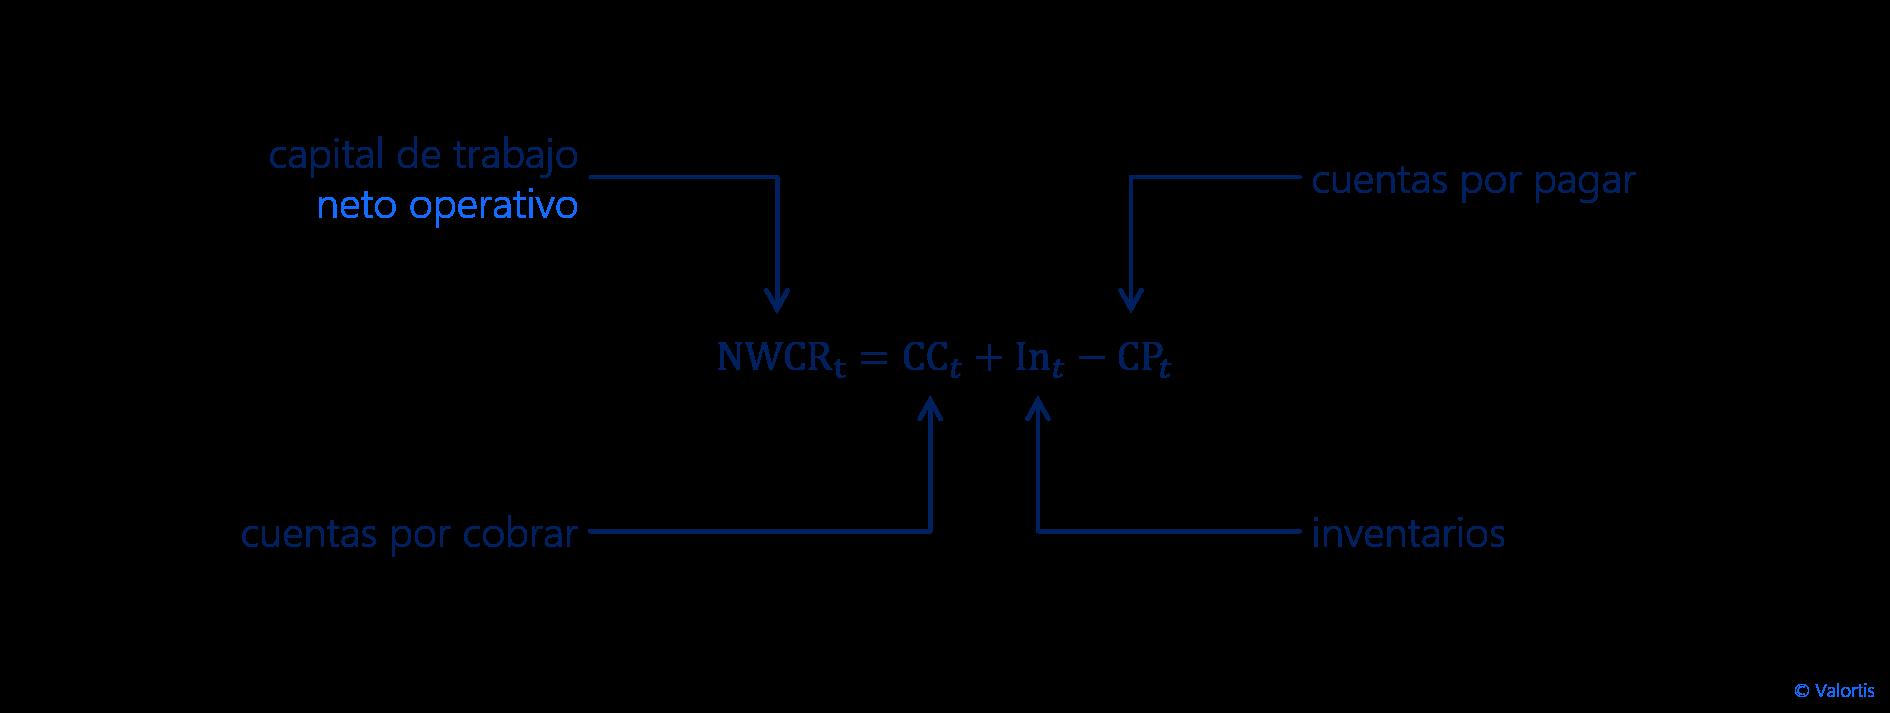 formula - capitald de trabajo neto operativo